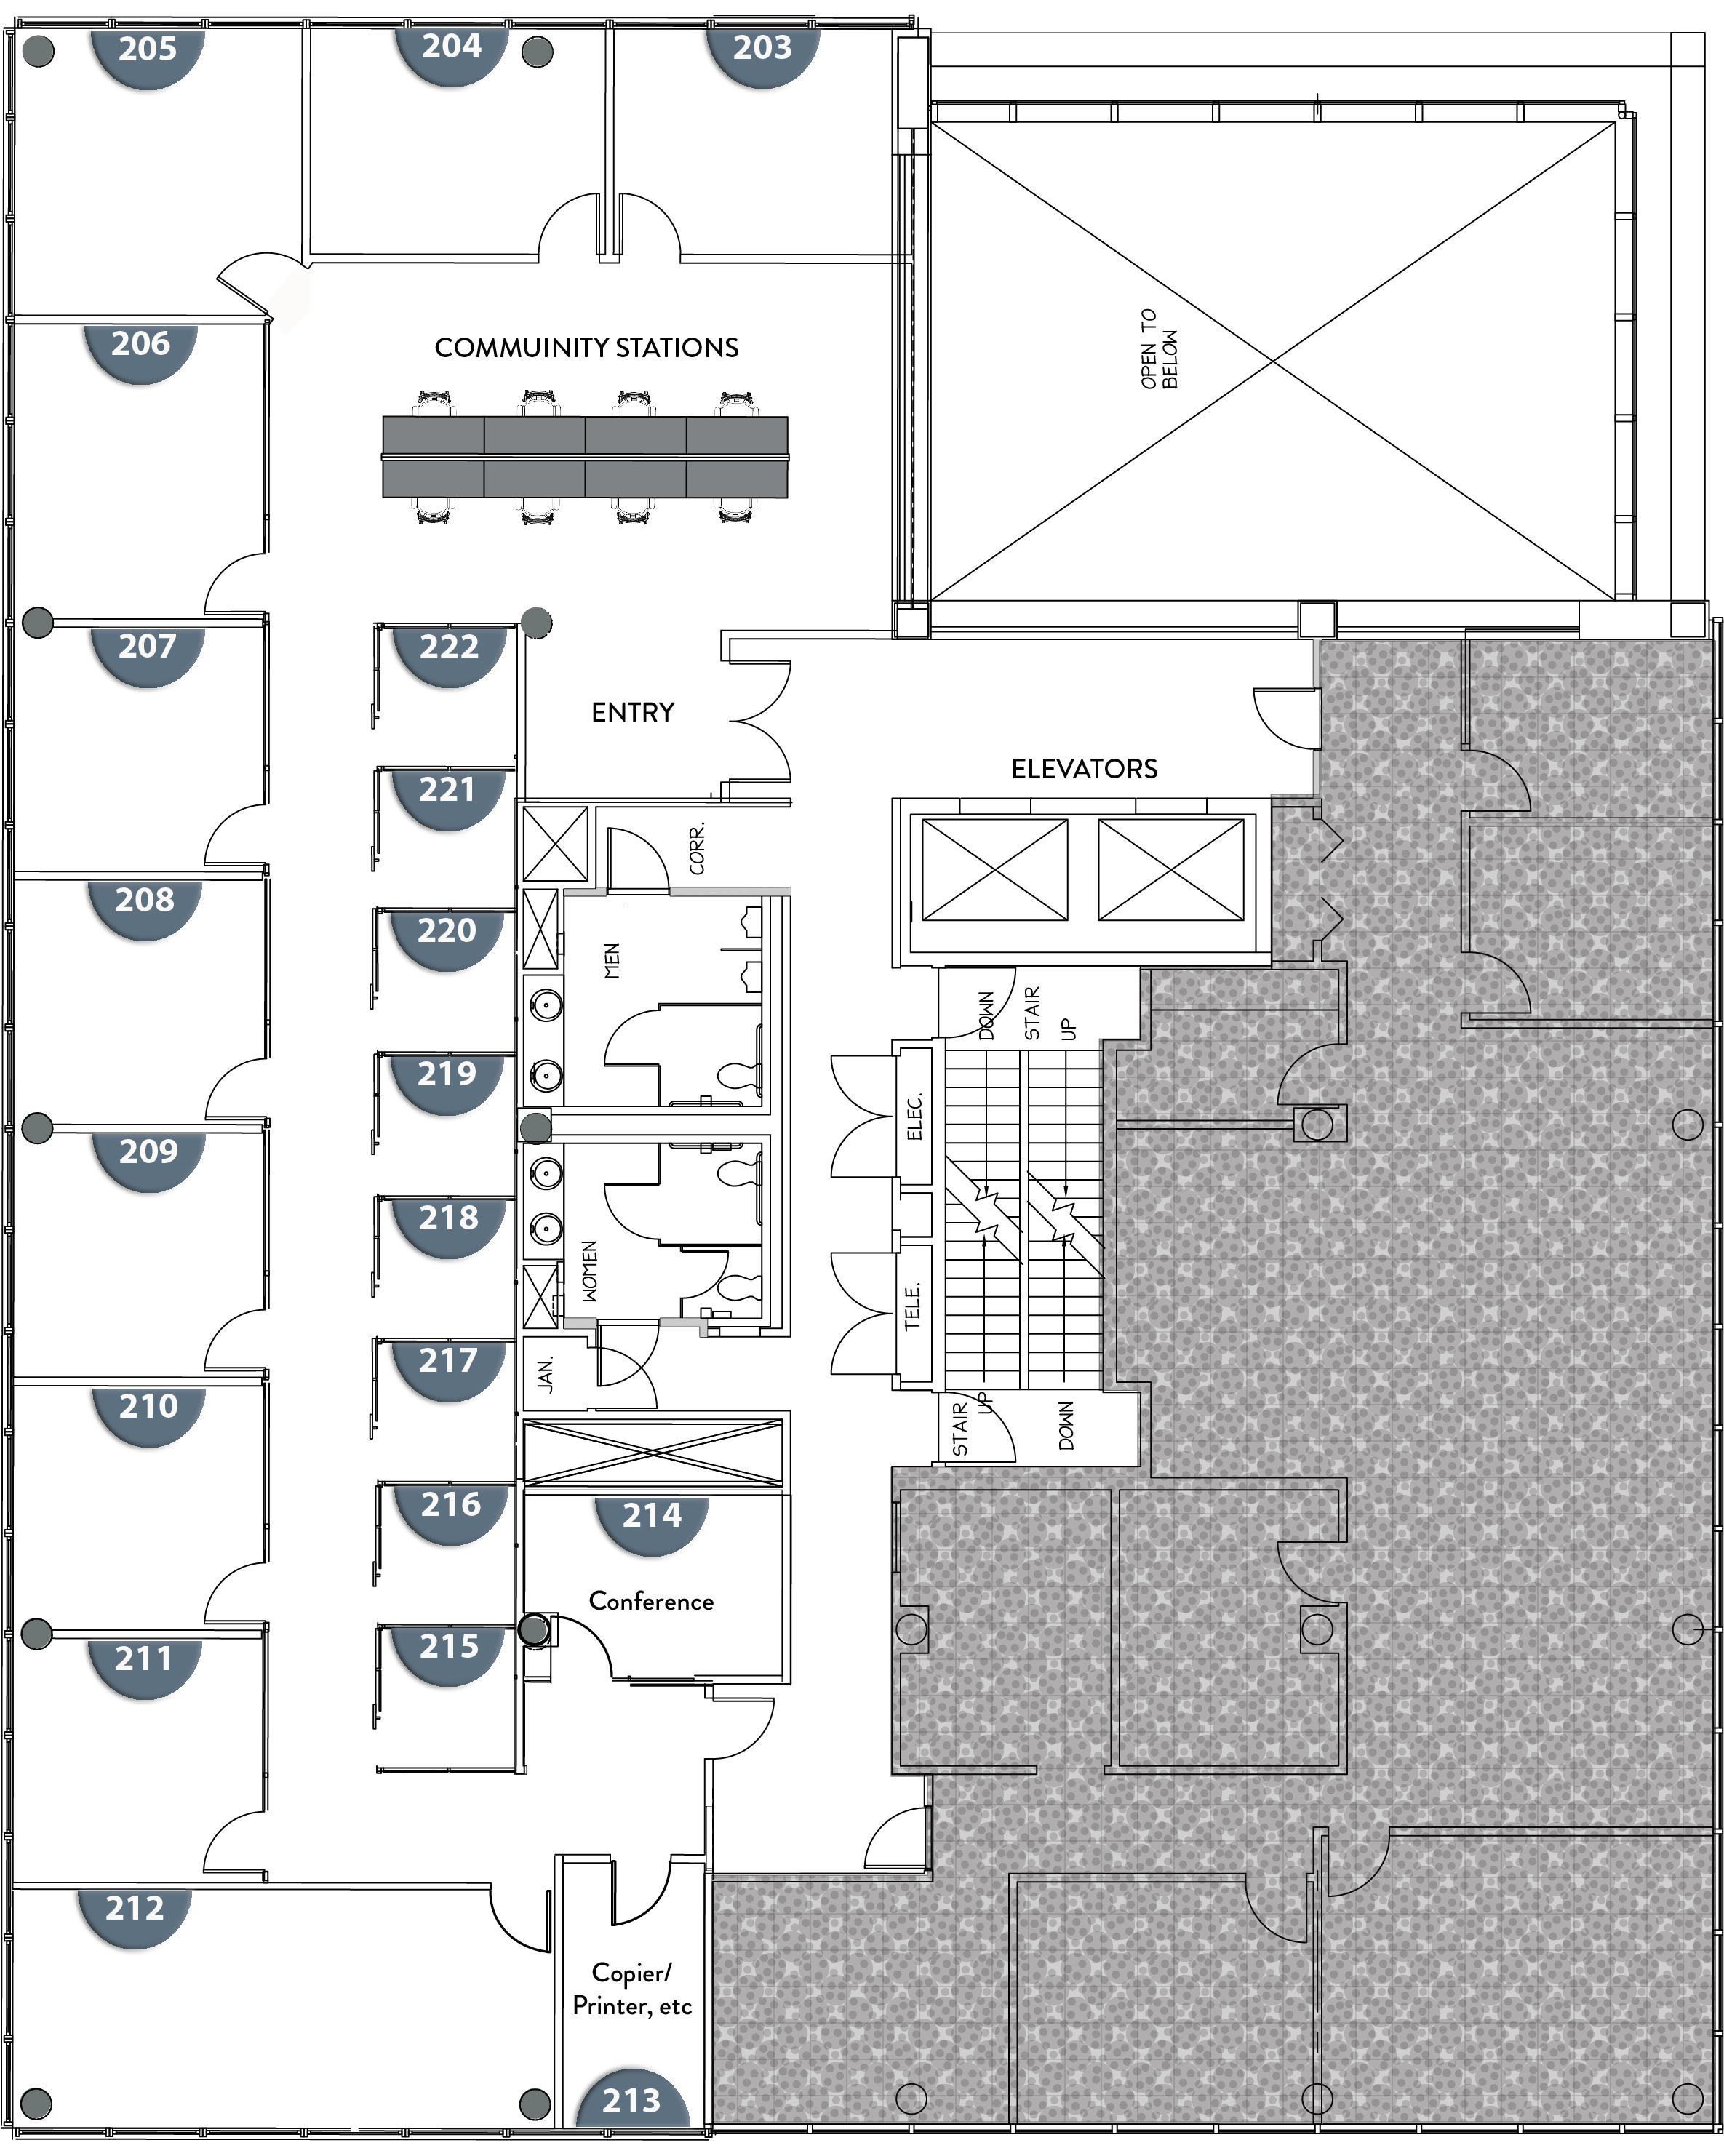 2nd floor layout-2017.jpg